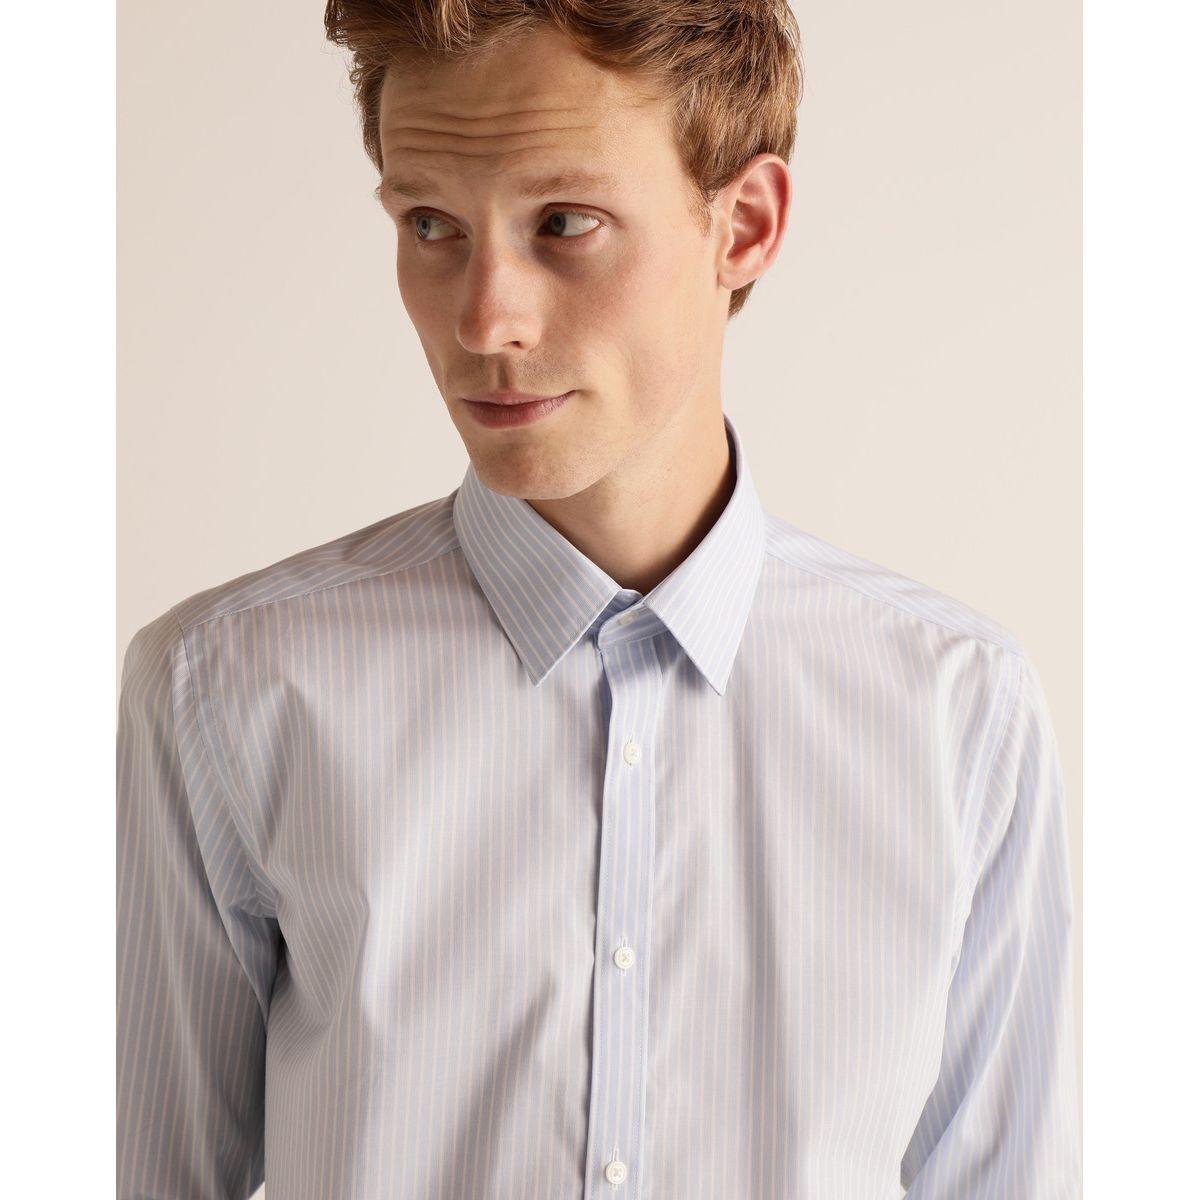 Chemise slim habillée Non Iron   rayée bleu